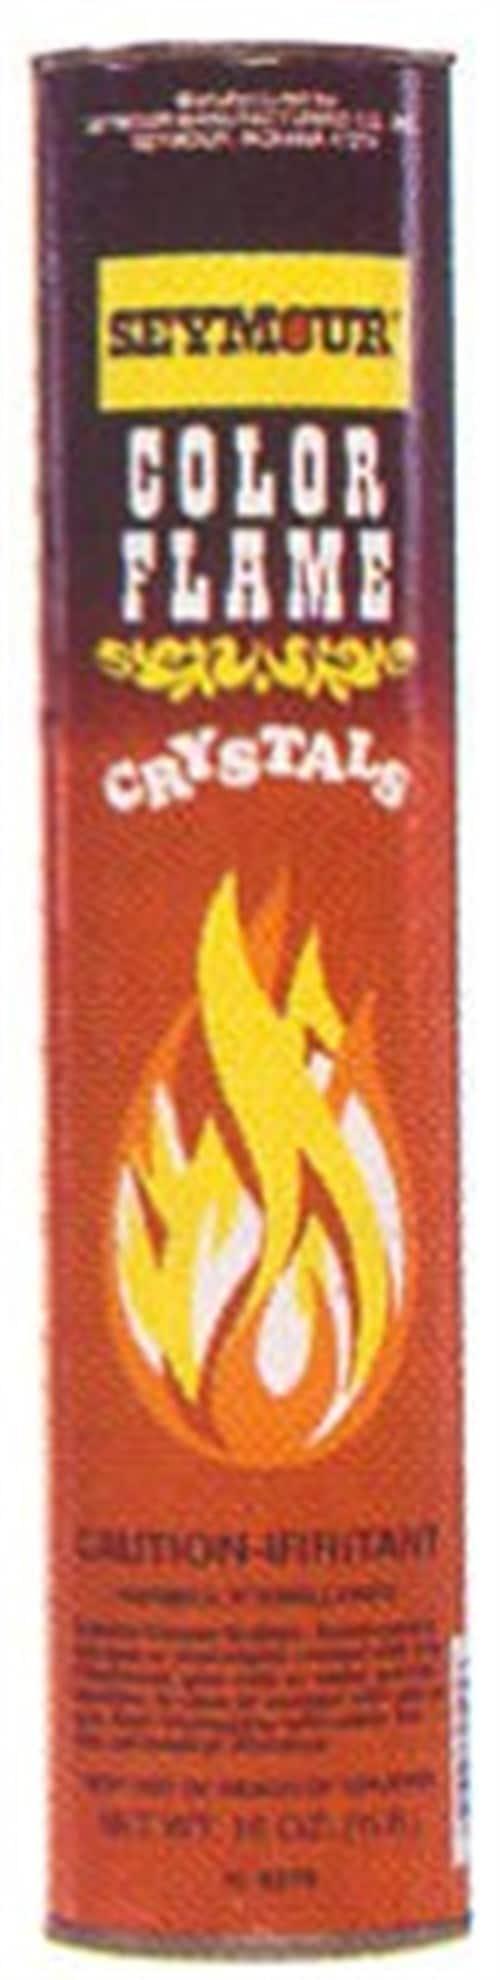 Seymour Mfg. 30-525 Color Flame Crystals-LB COLOR CRYSTALS 1